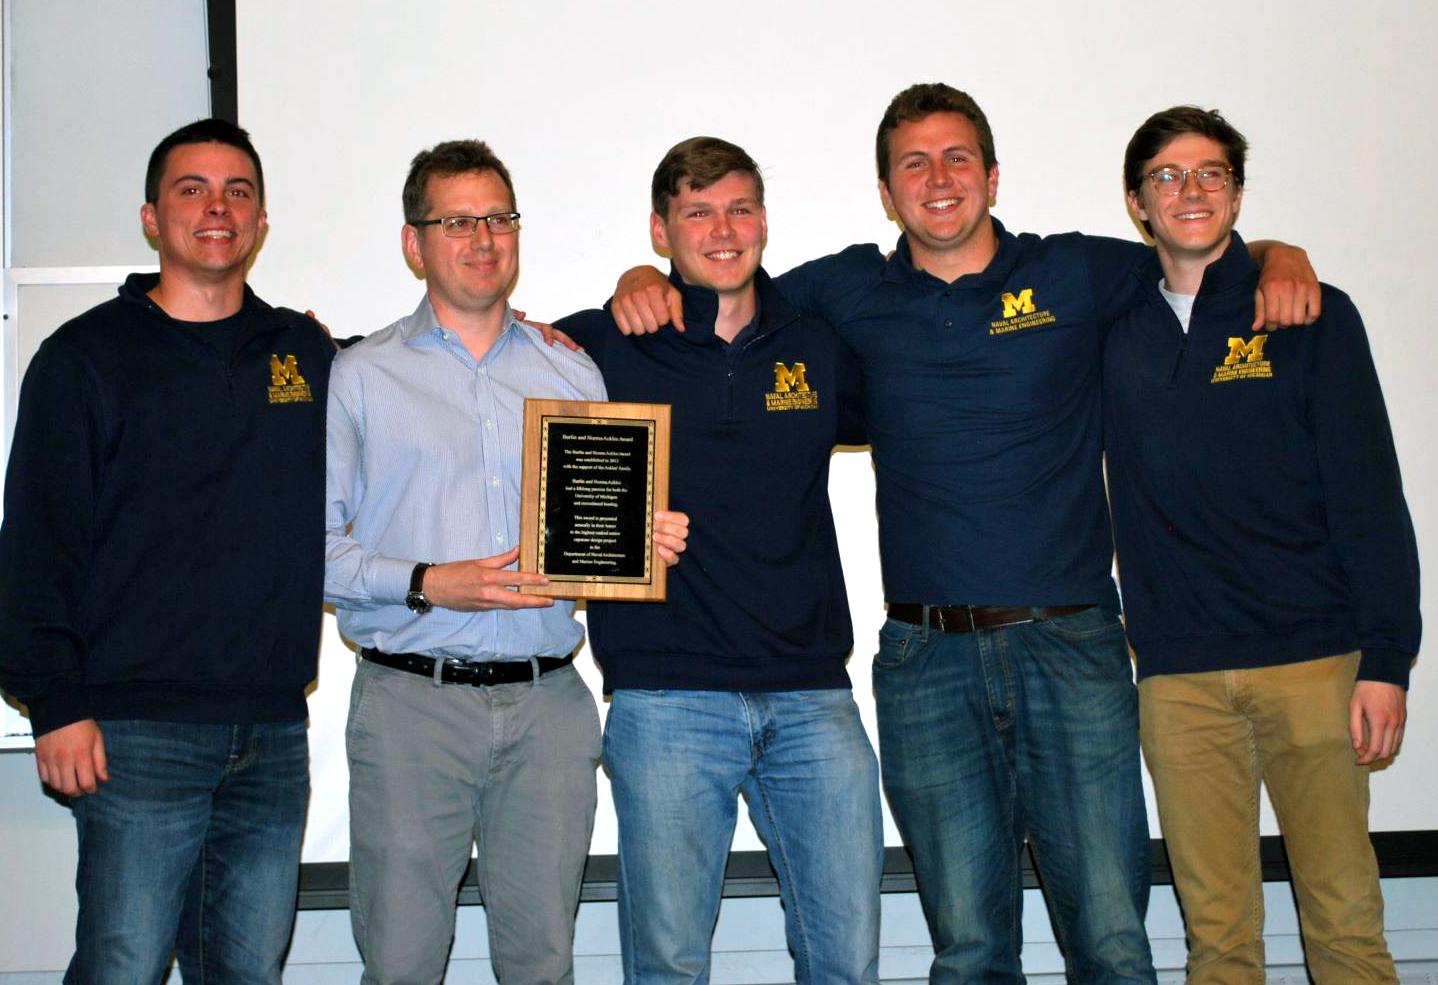 Team Blueship; SNAME Lysnyk Winners